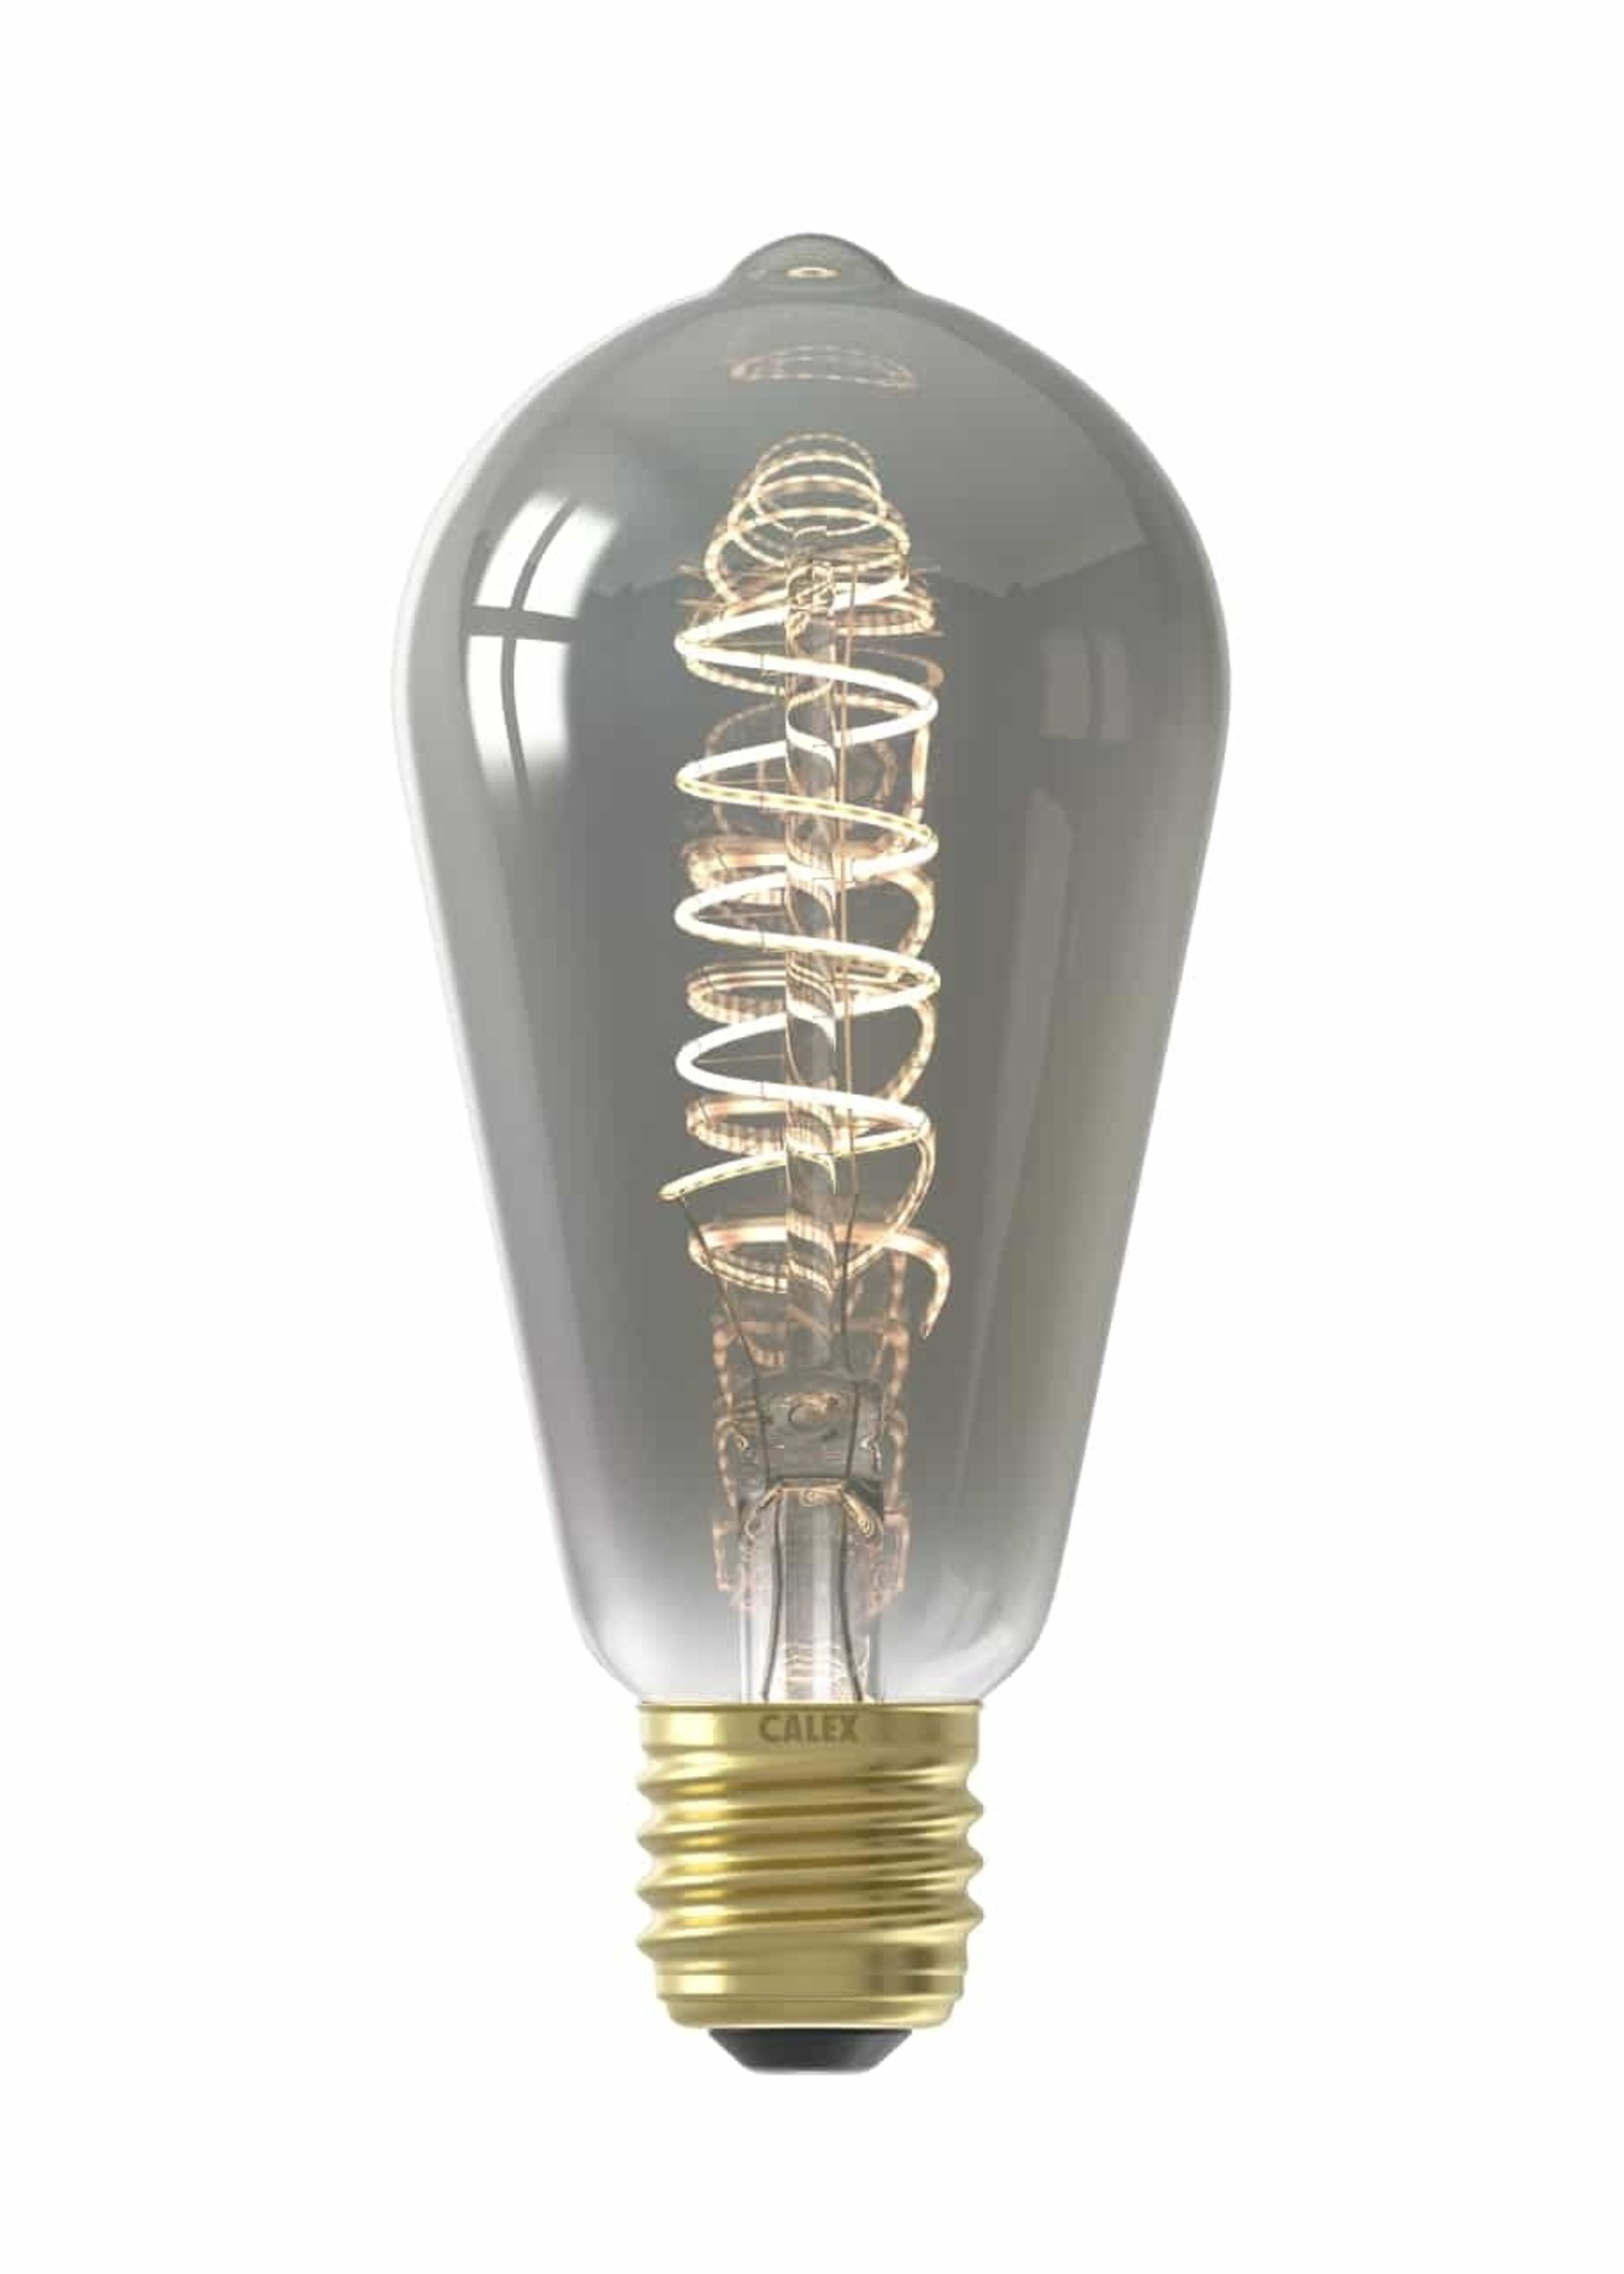 Calex Calex LED volglas Flex Filament Rustieklamp 220-240V 4W 100lm E27 ST64, Titanium 2100K Dimbaar, energielabel B